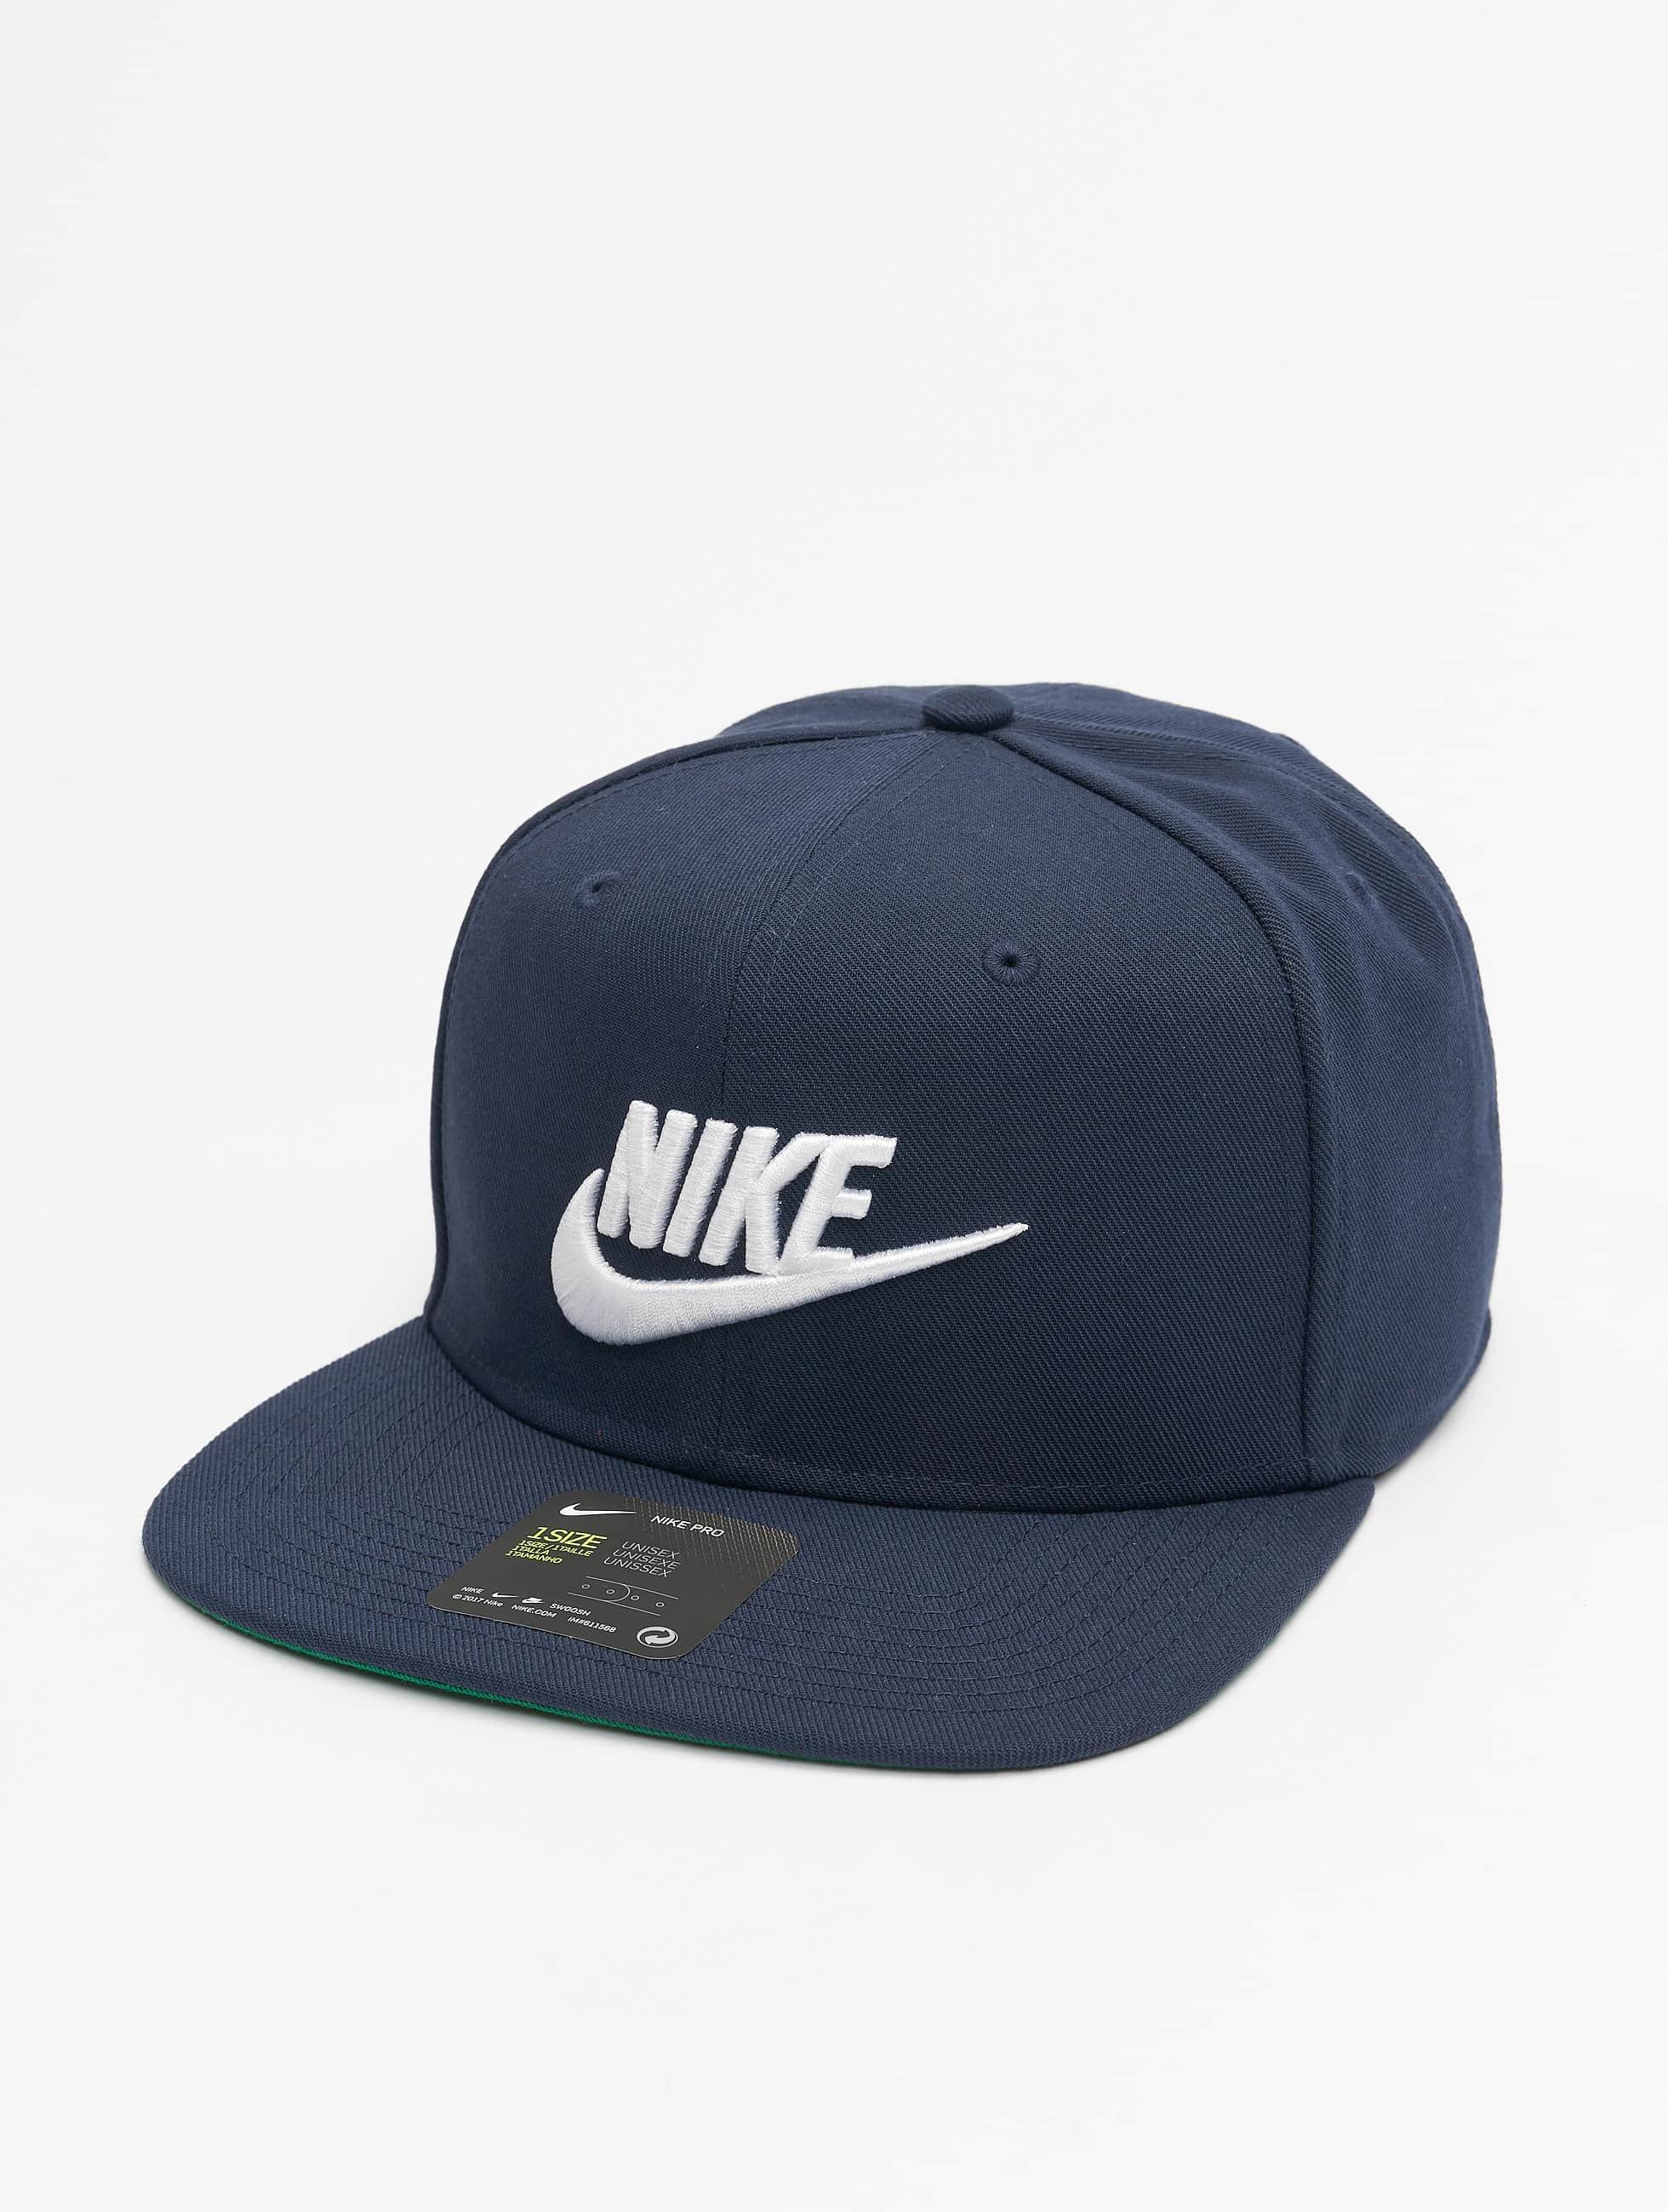 Nike Sportswear Futura Pro Snapback Cap Obsidian/Pine Green/Black/White